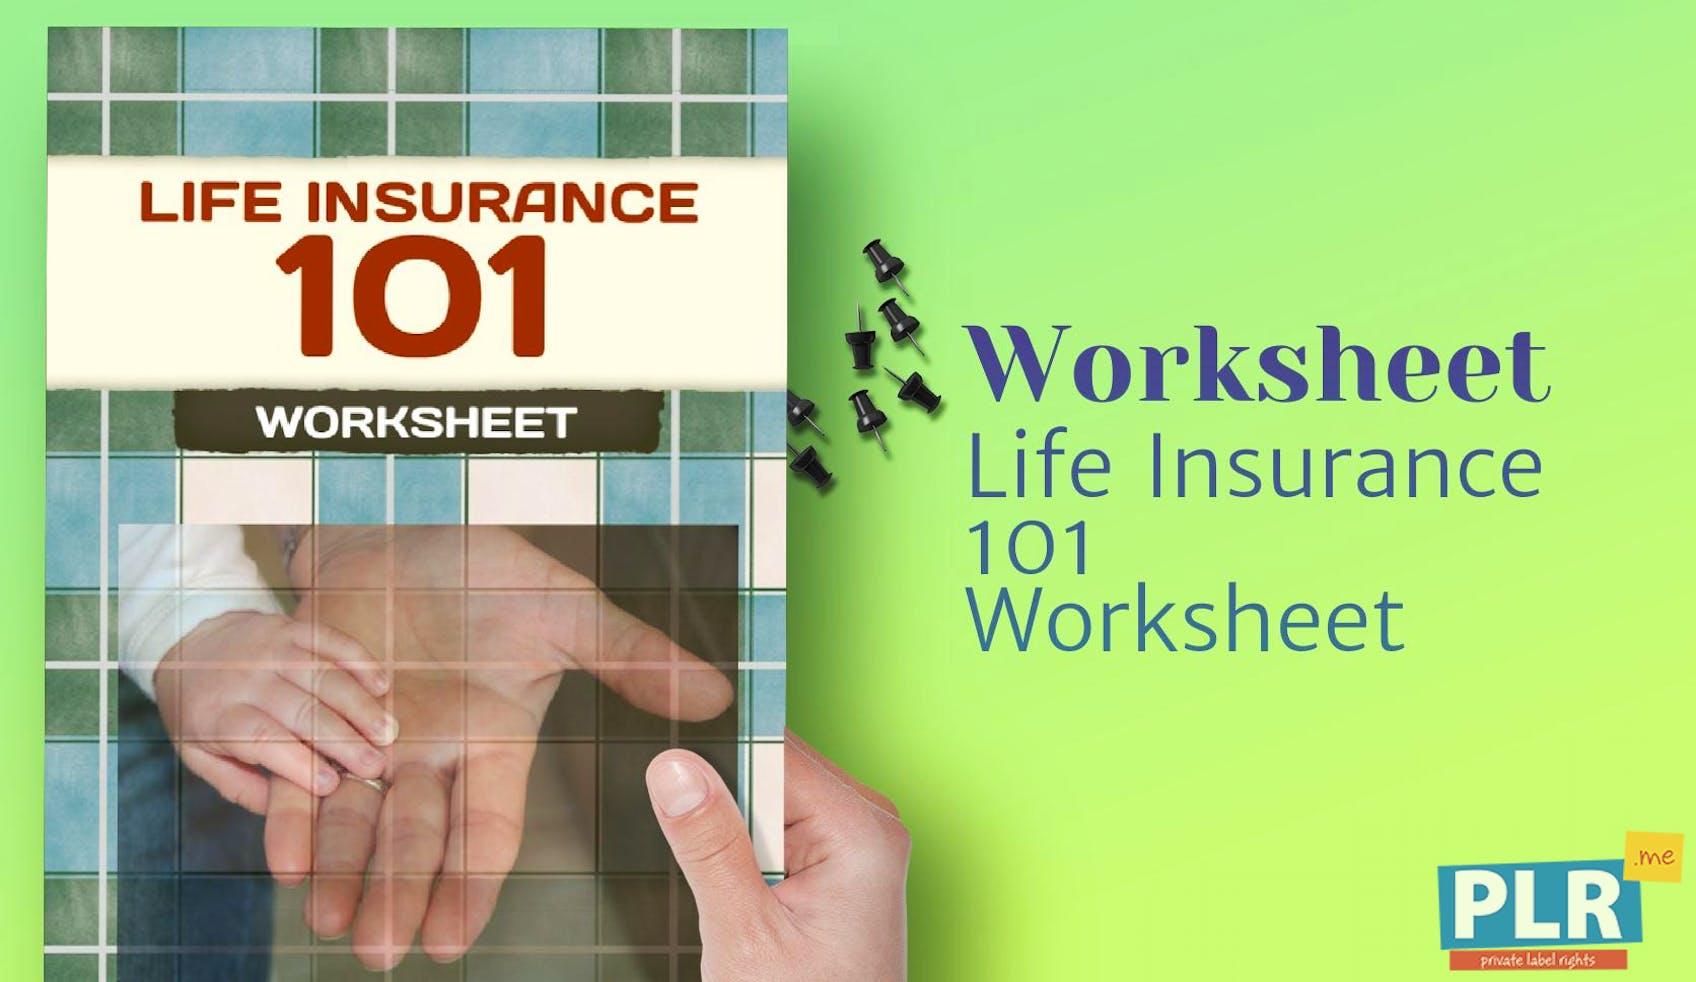 Plrgix3861 life insurance 101 worksheet 1 altavistaventures Images